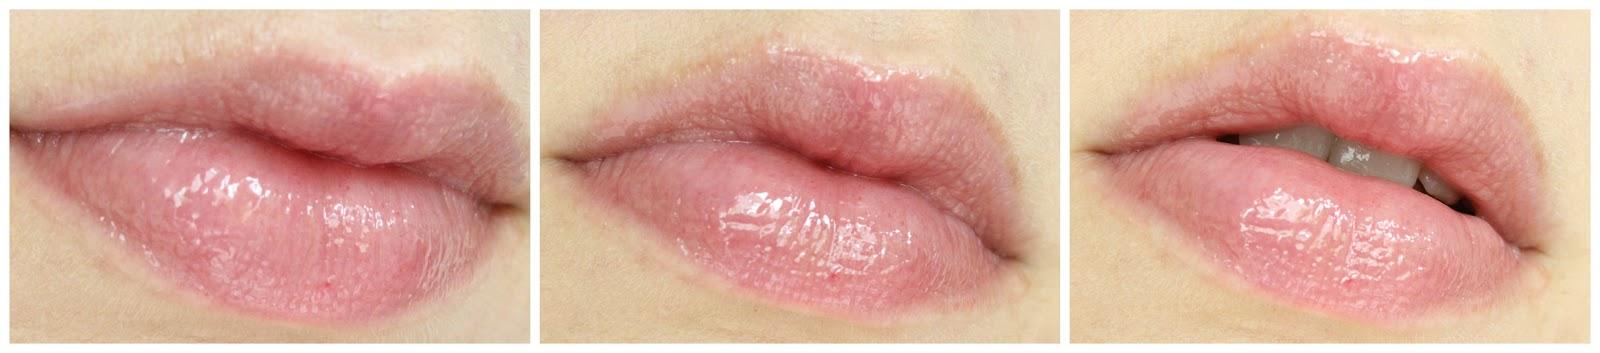 Lippen mit Clinique Superbalm Moisturizing Gloss Raspberry